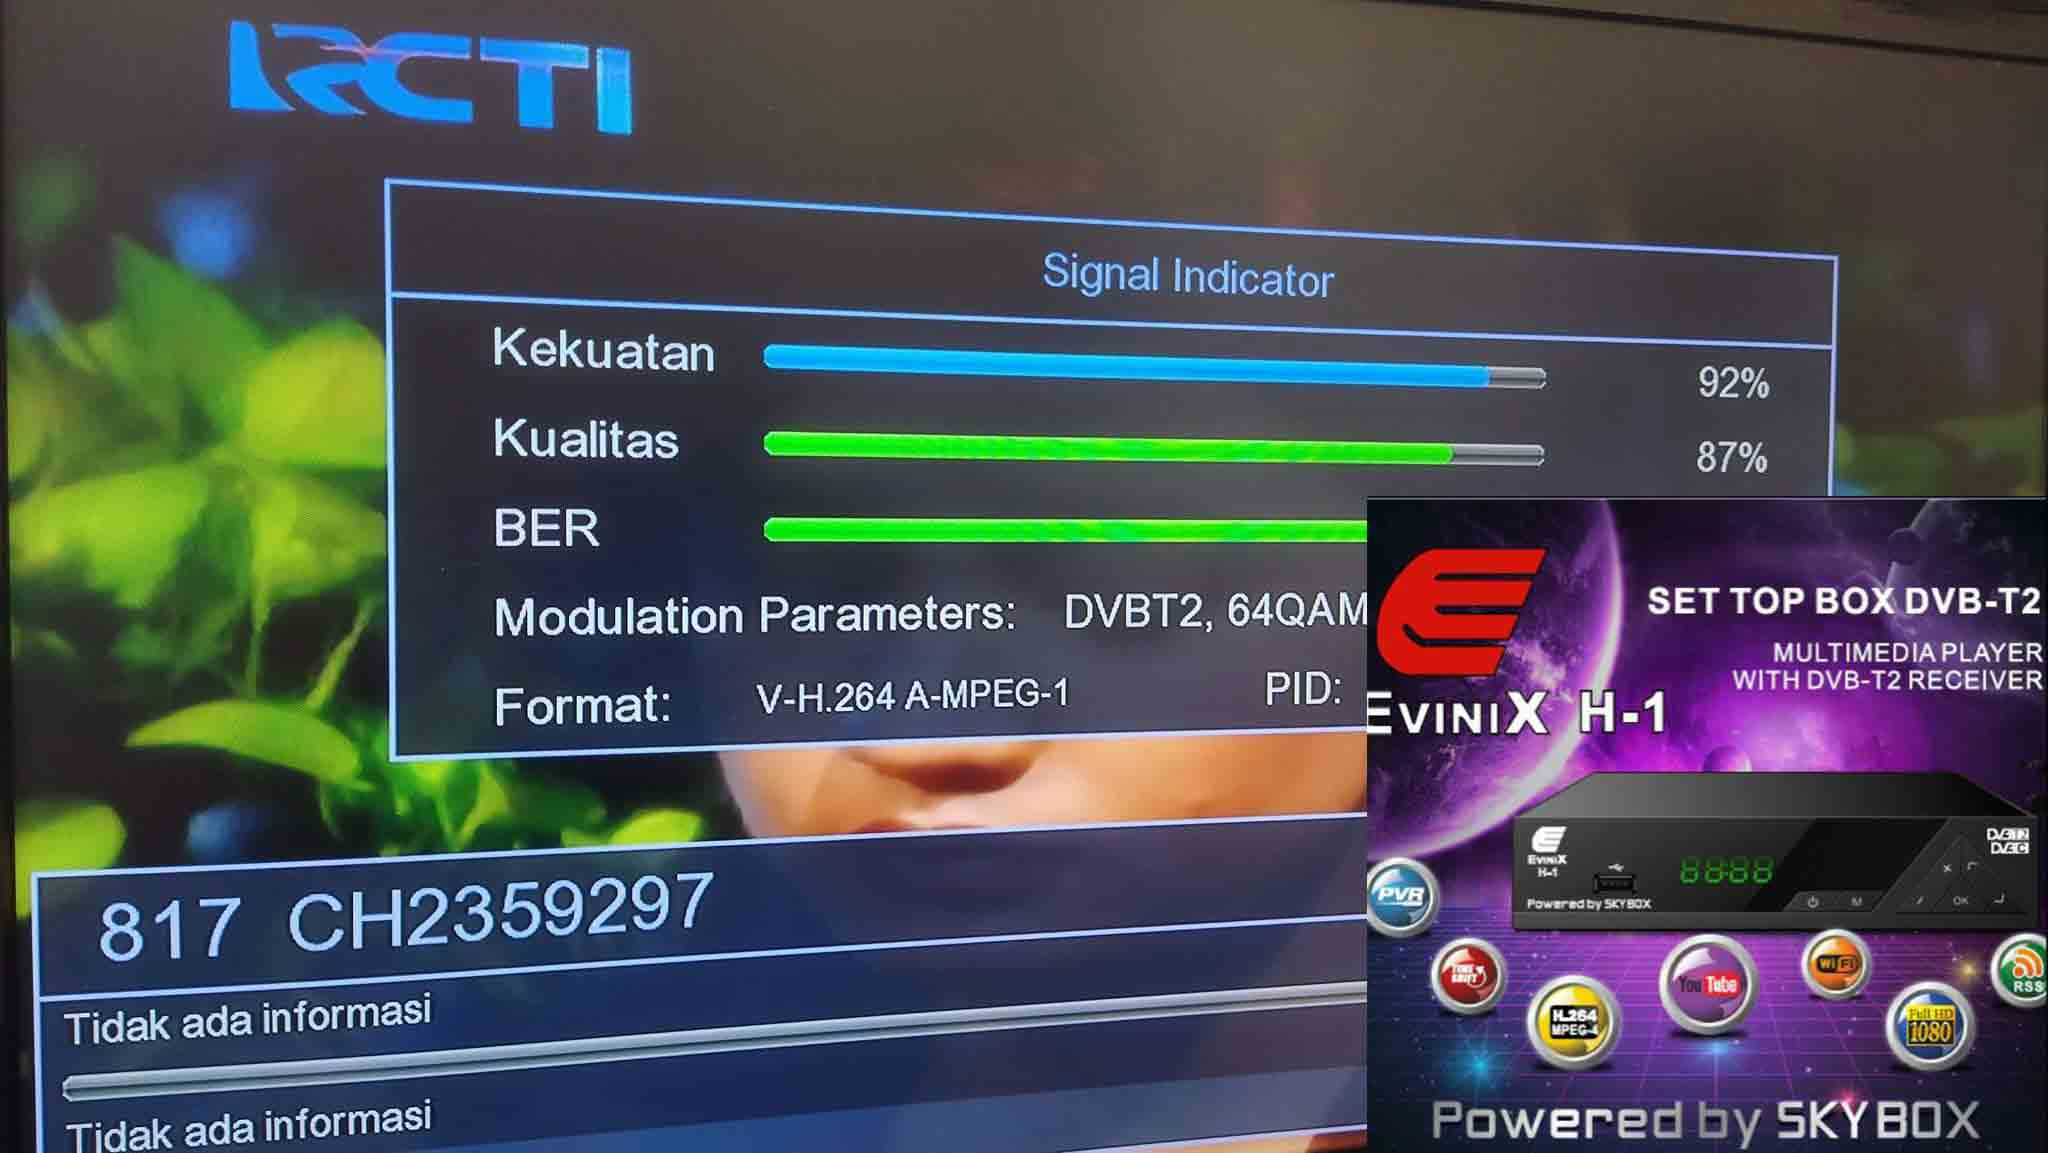 Firmware STB DVBT2 Evinix H1